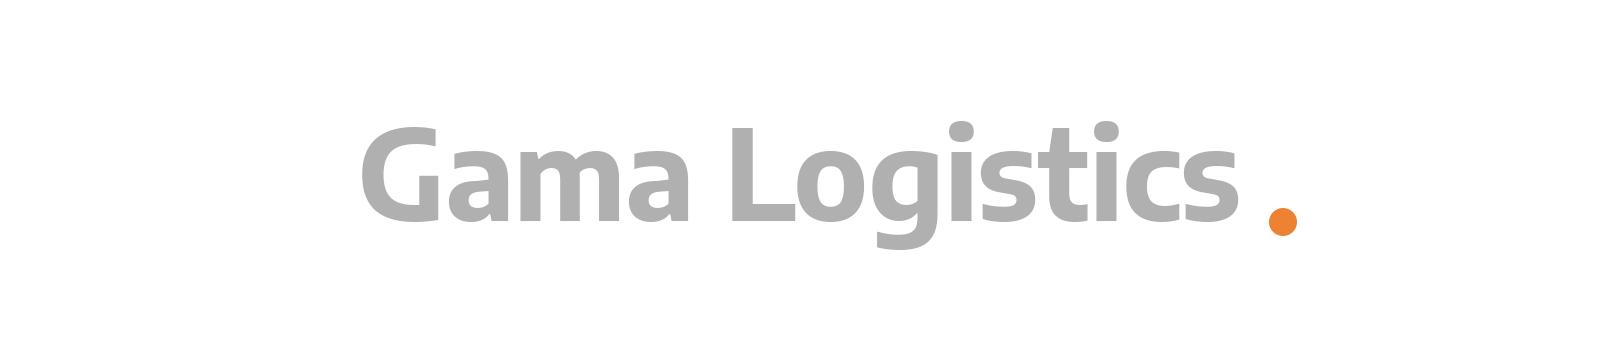 Gama Logistics